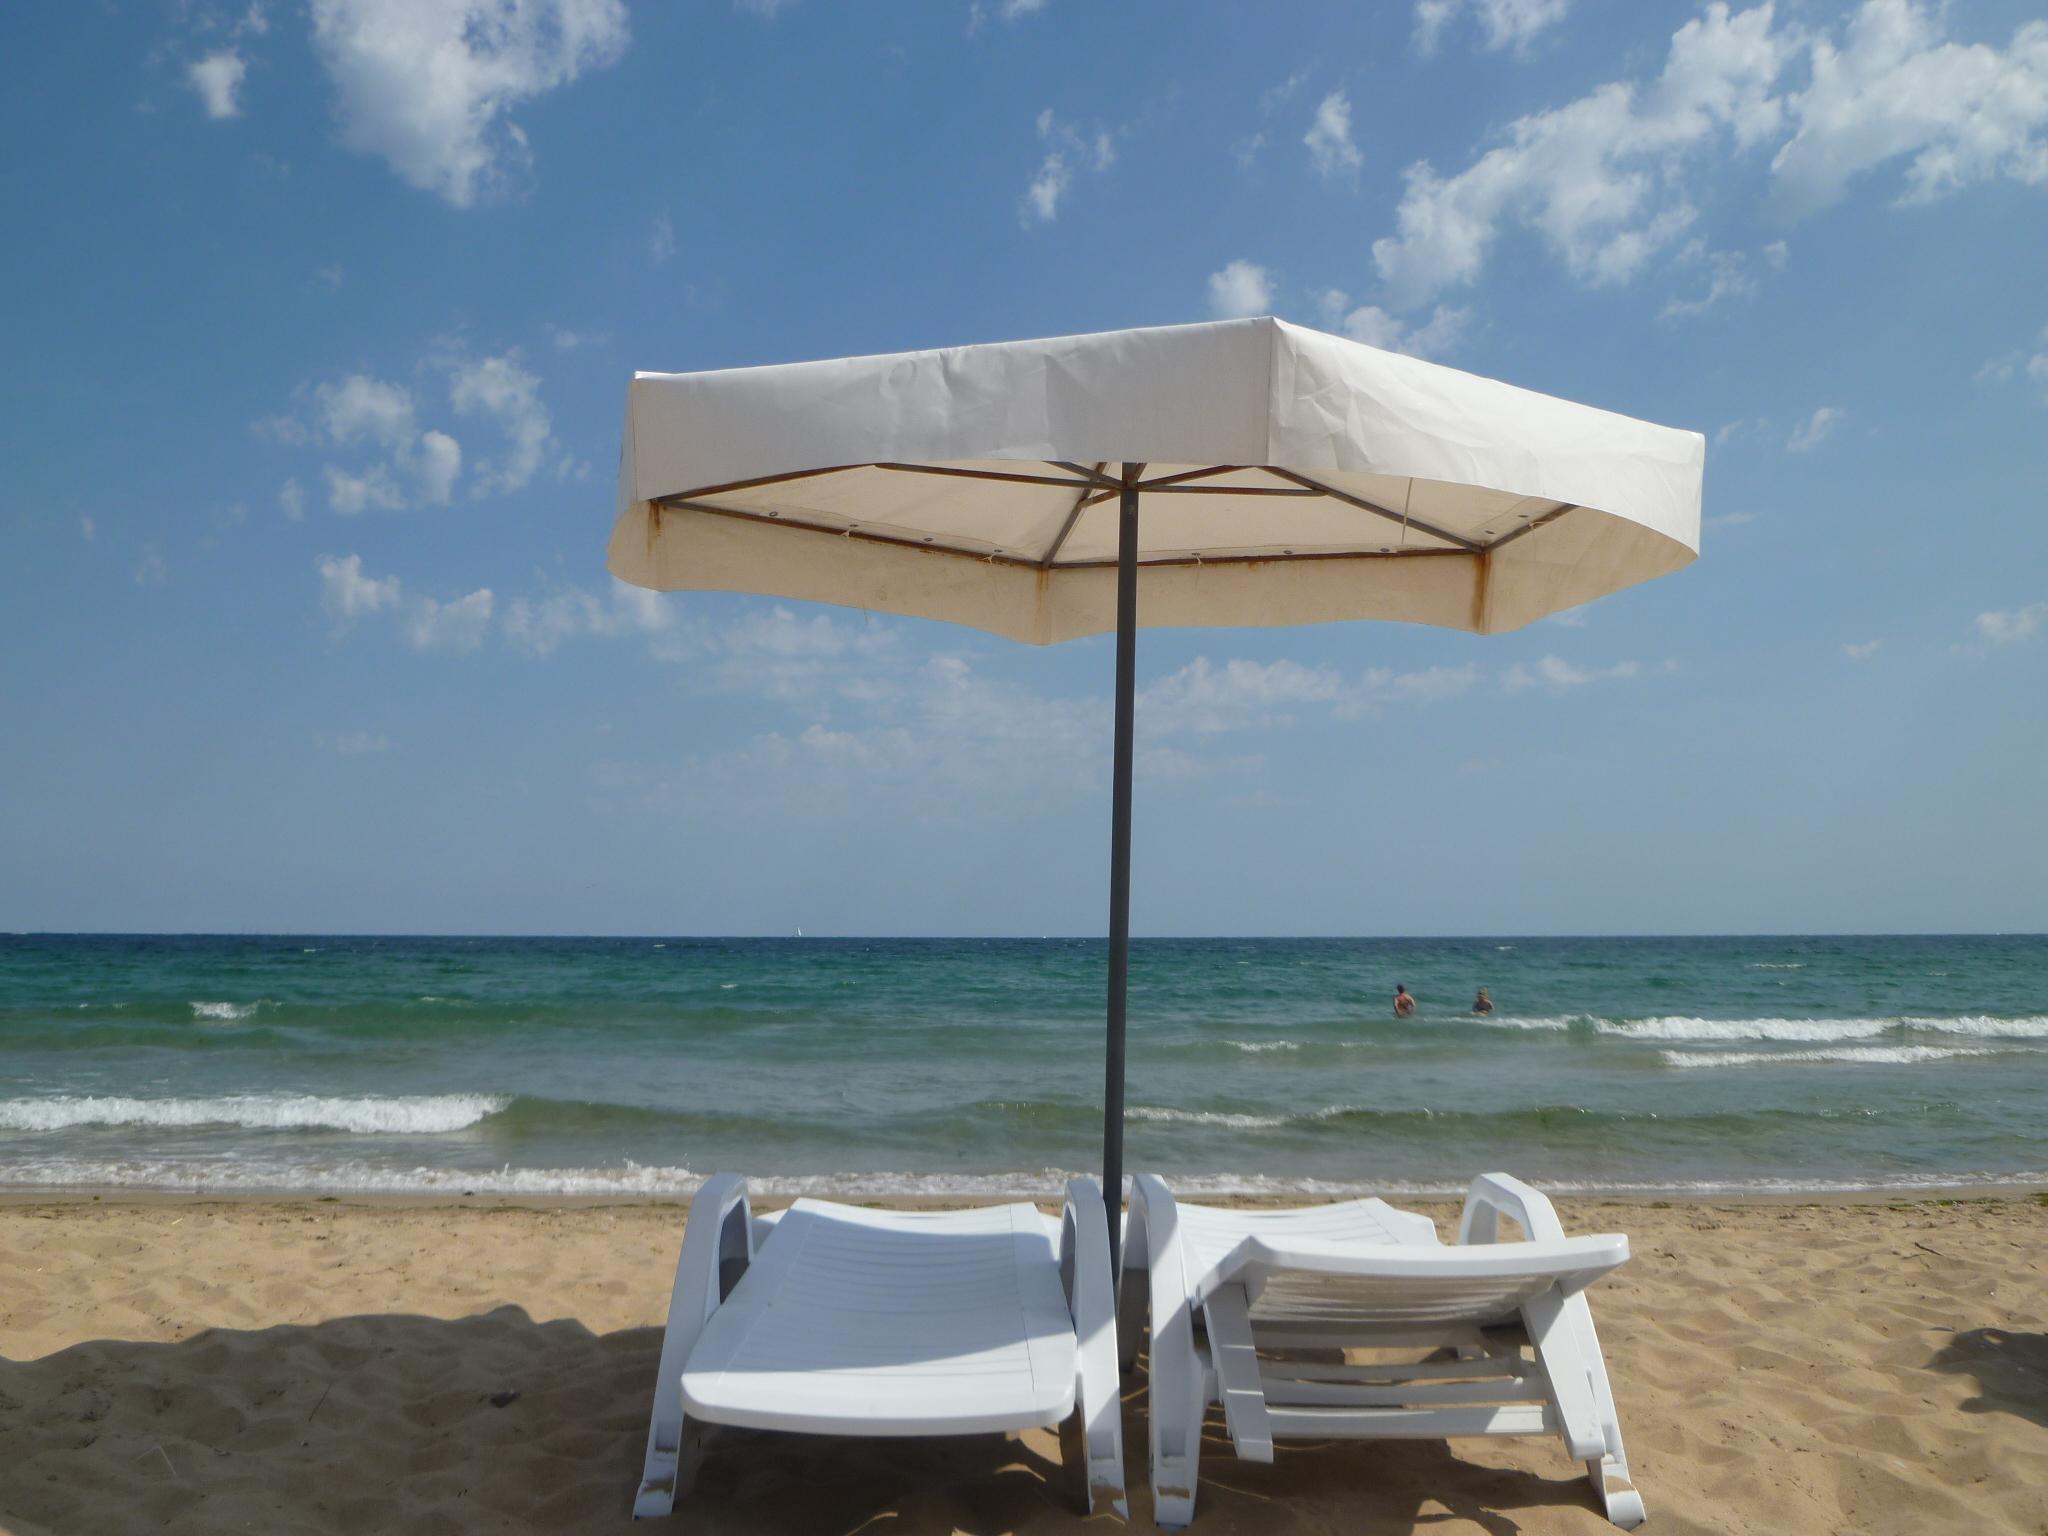 Bulgaria saw strong tourist season in summer 2013